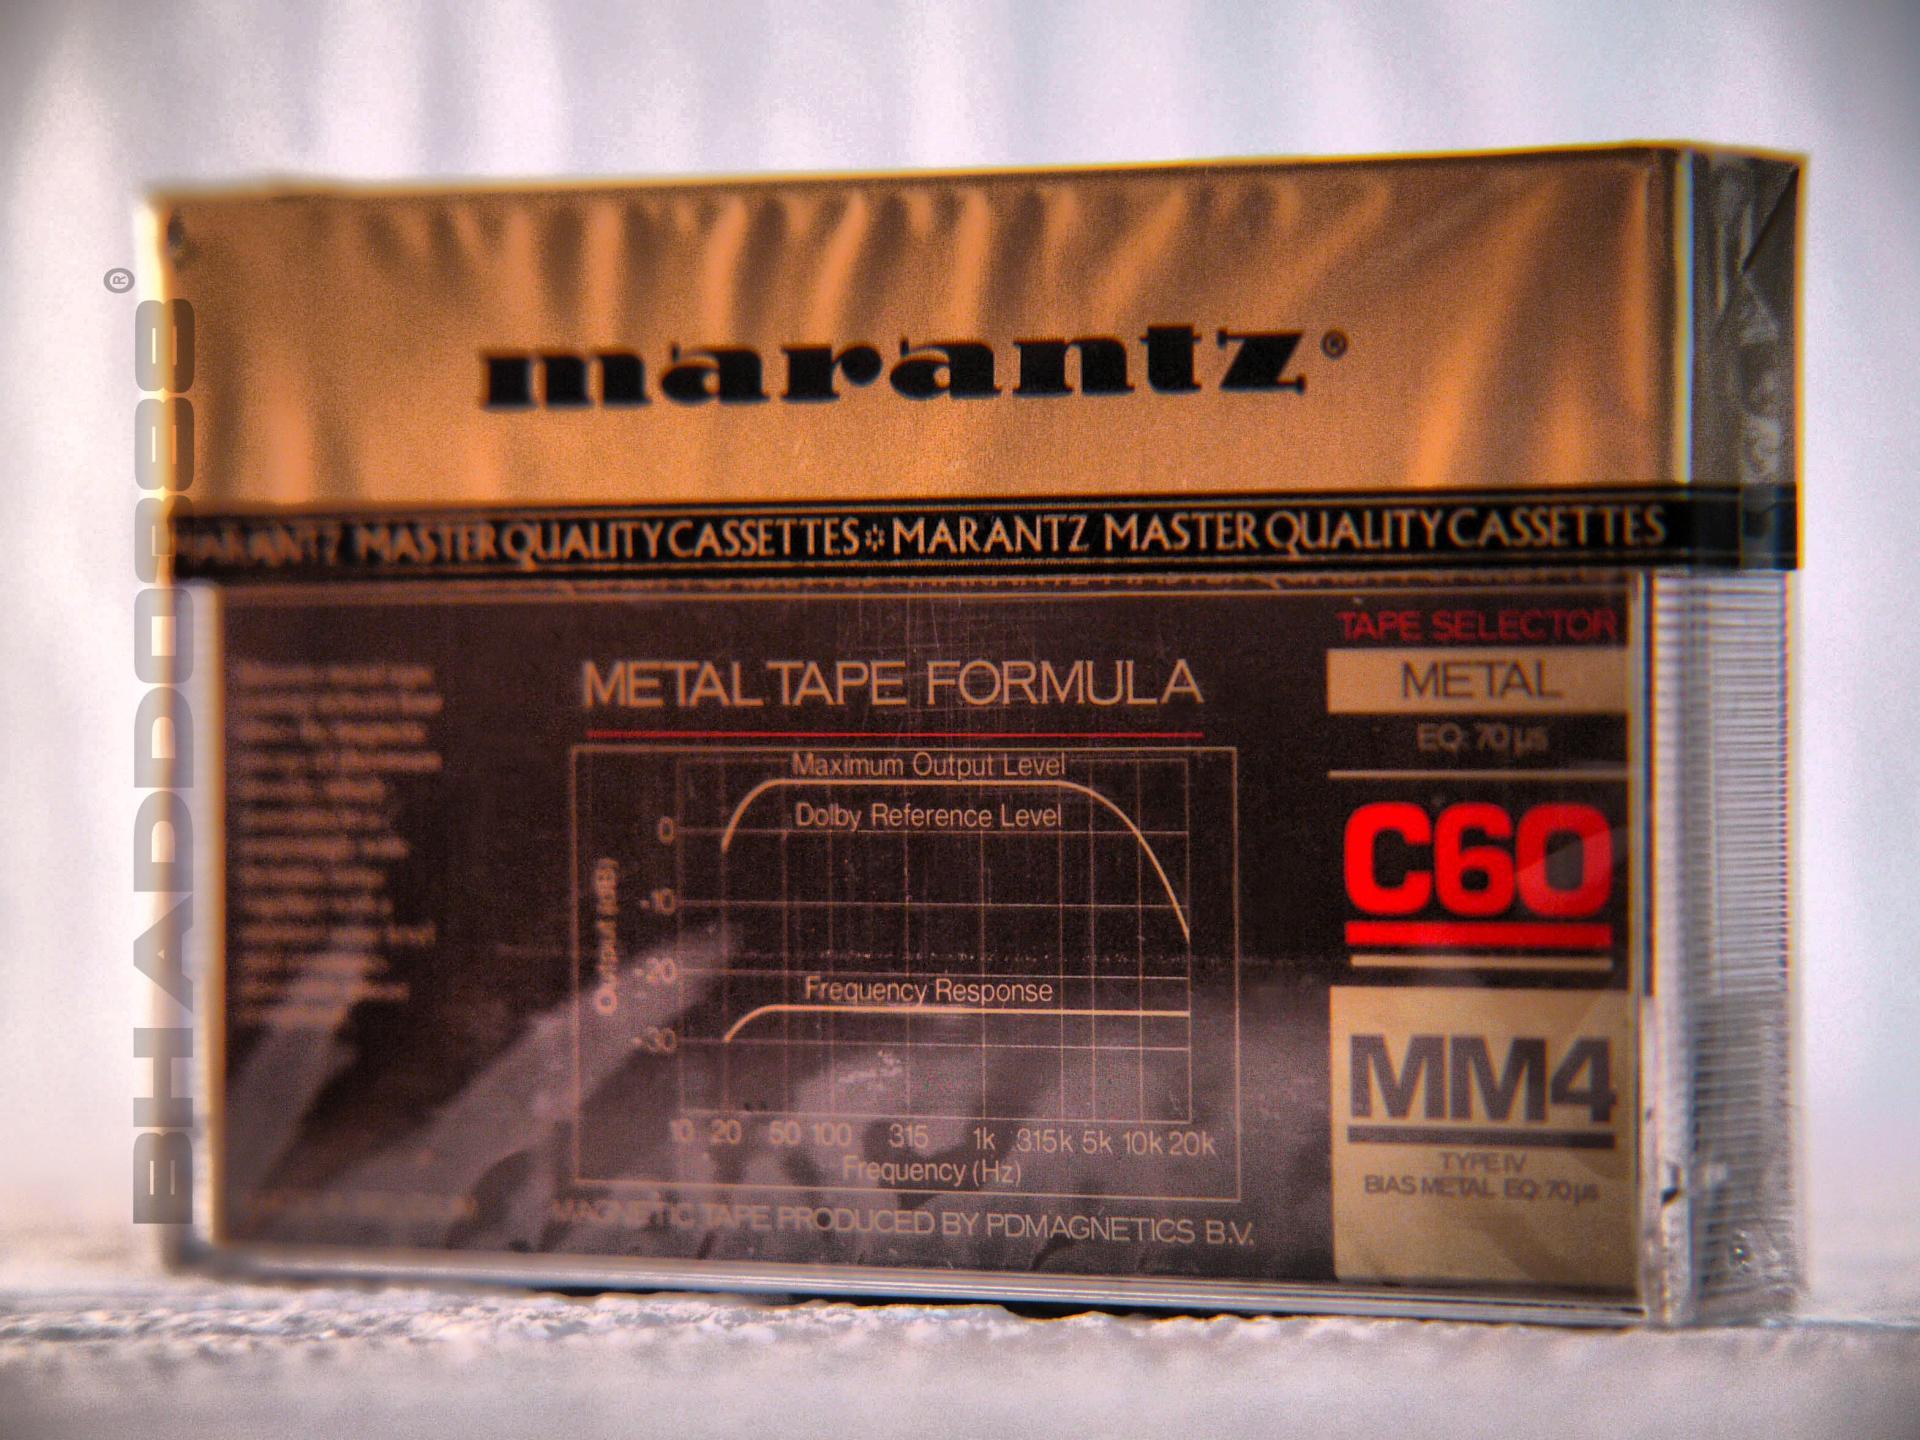 MARANTZ MM4 - 02